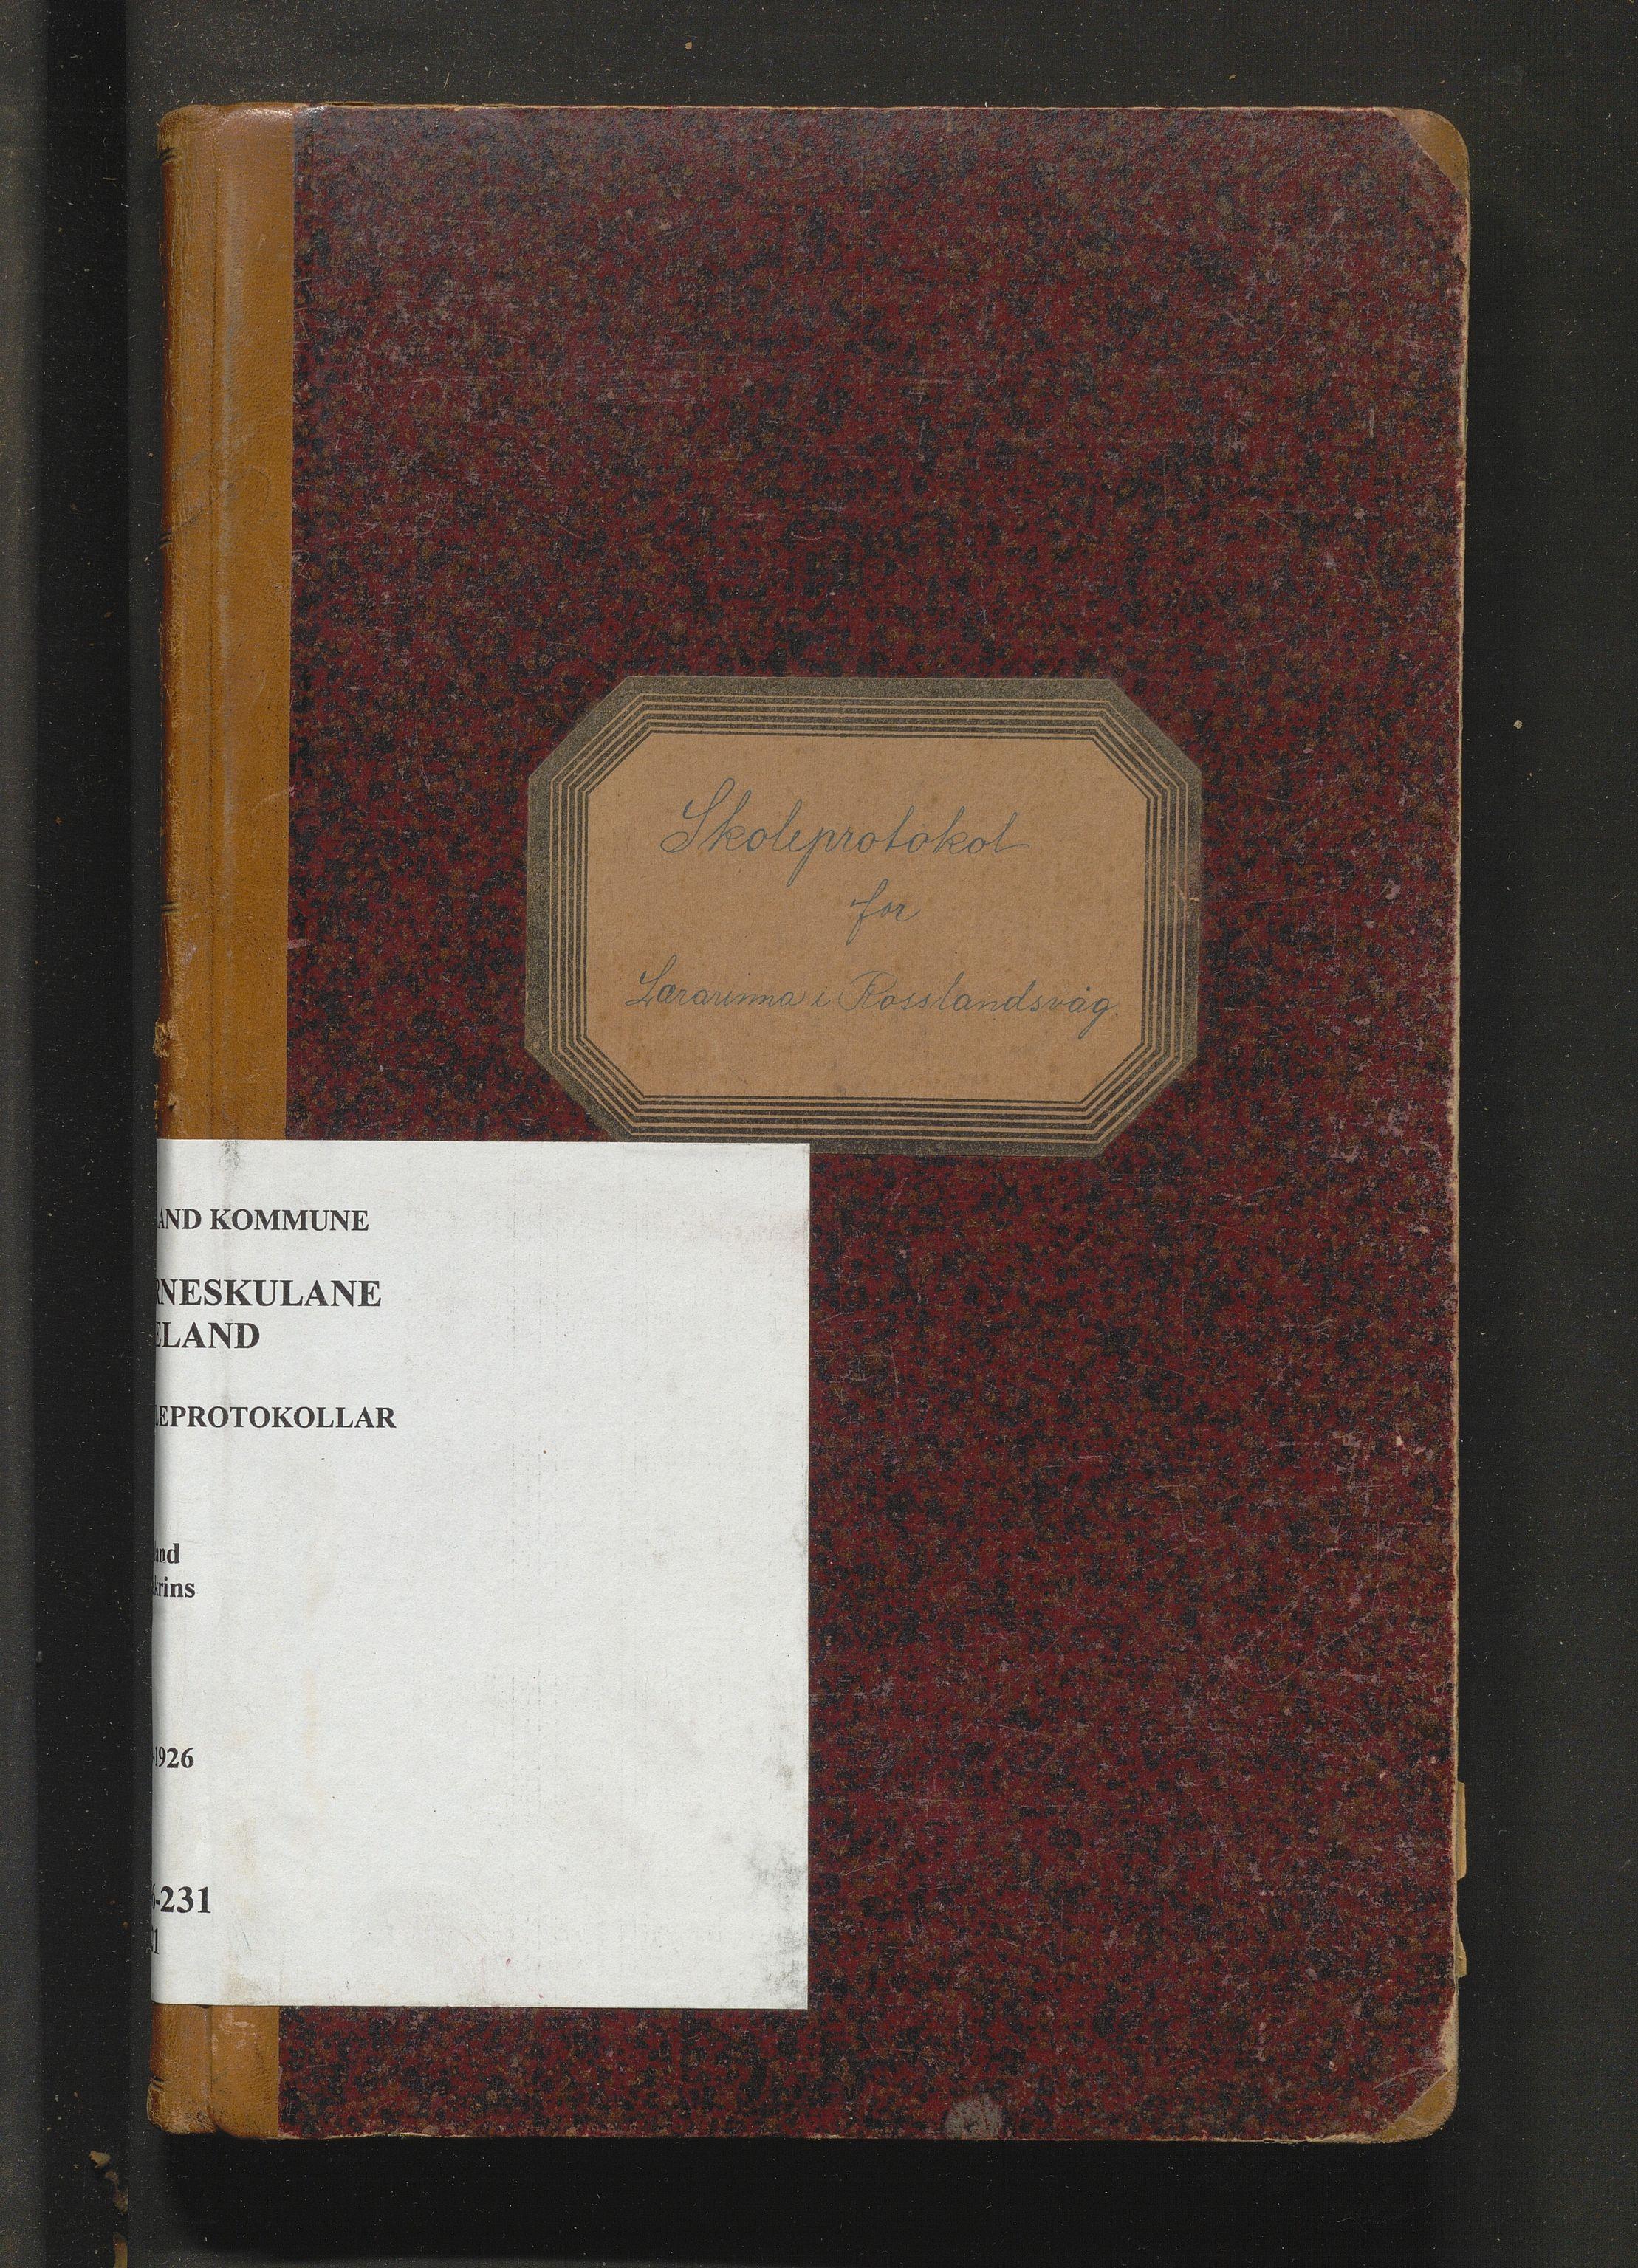 IKAH, Meland kommune. Barneskulane, F/Fa/L0021: Skuleprotokoll for Rossland krins, 1923-1926